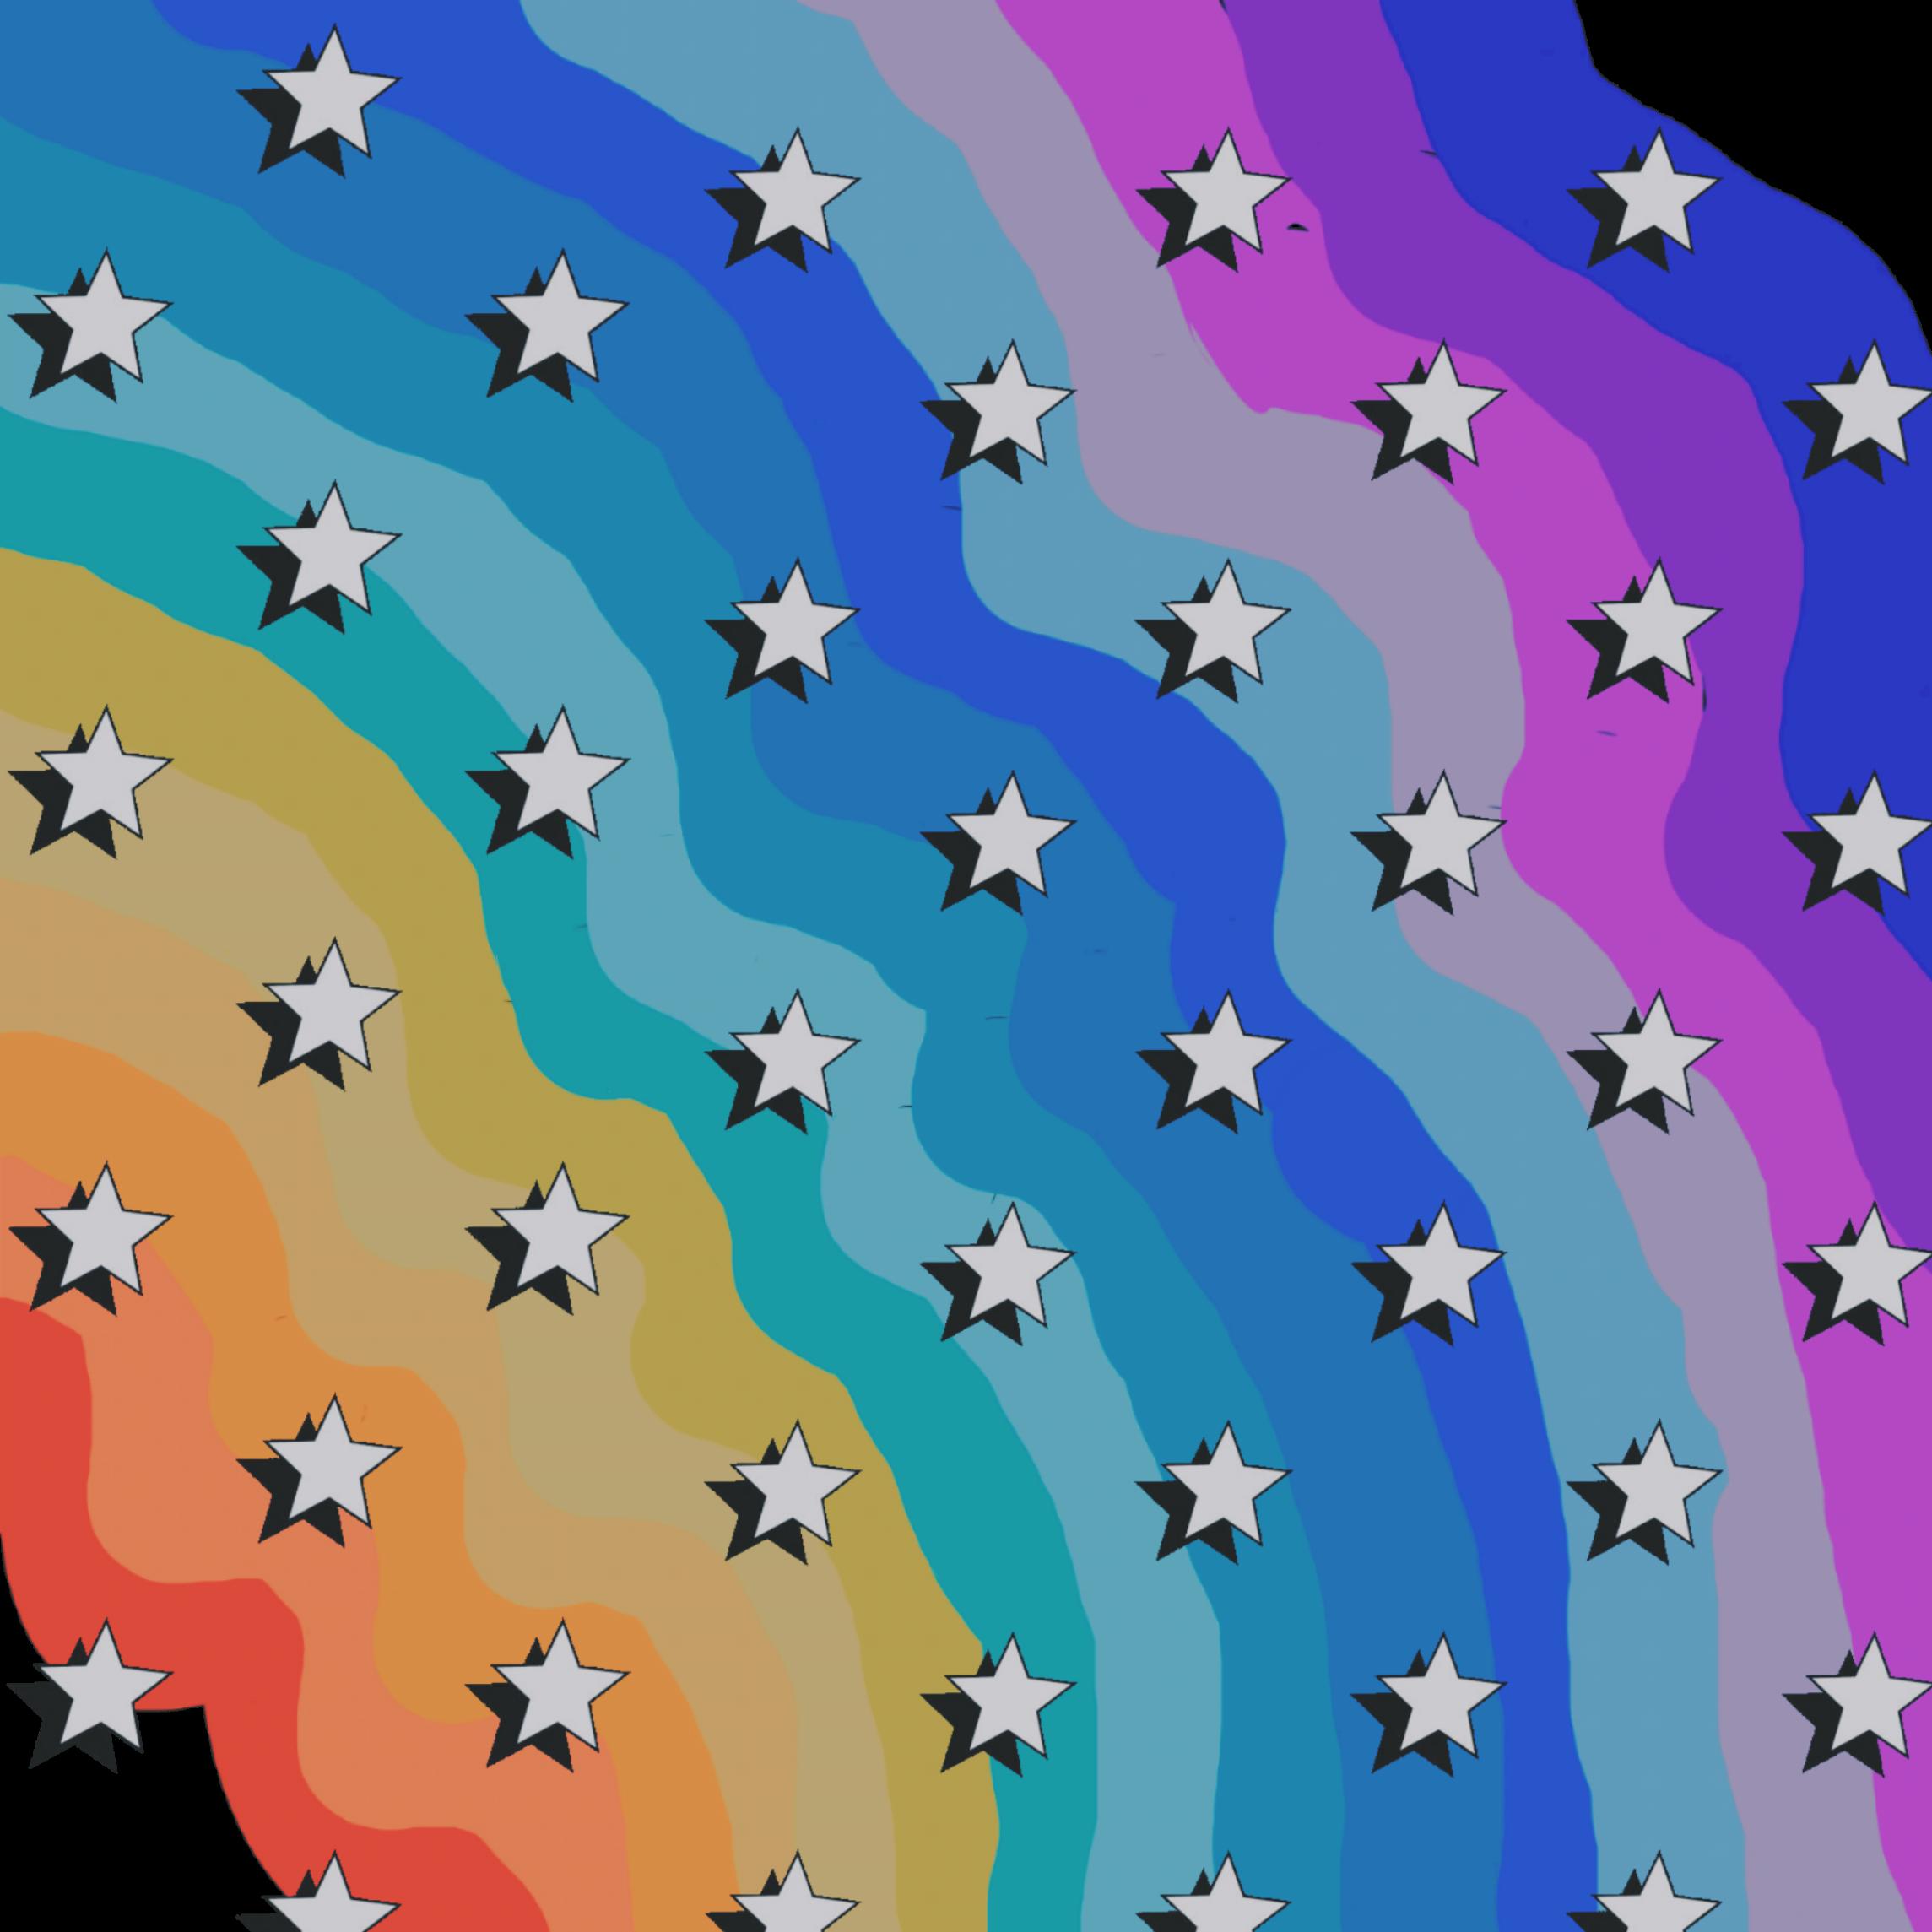 rainbows aestheticrainbow aesthetic background tumblr...